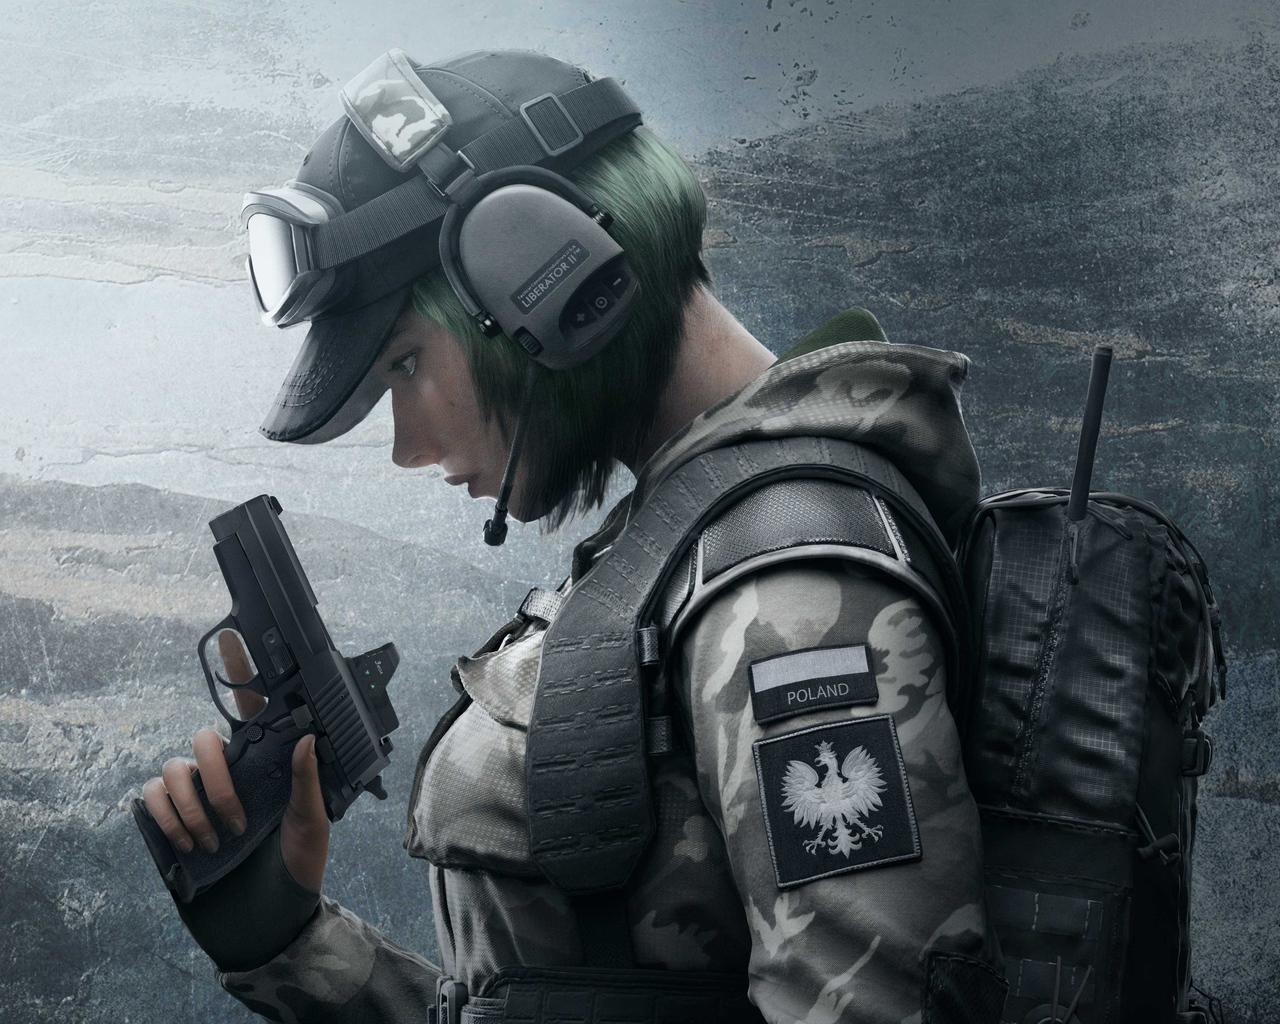 Rainbow Six Siege Wallpaper 4k: 1280x1024 Tom Clancys Rainbow Six Siege Soldier 5k